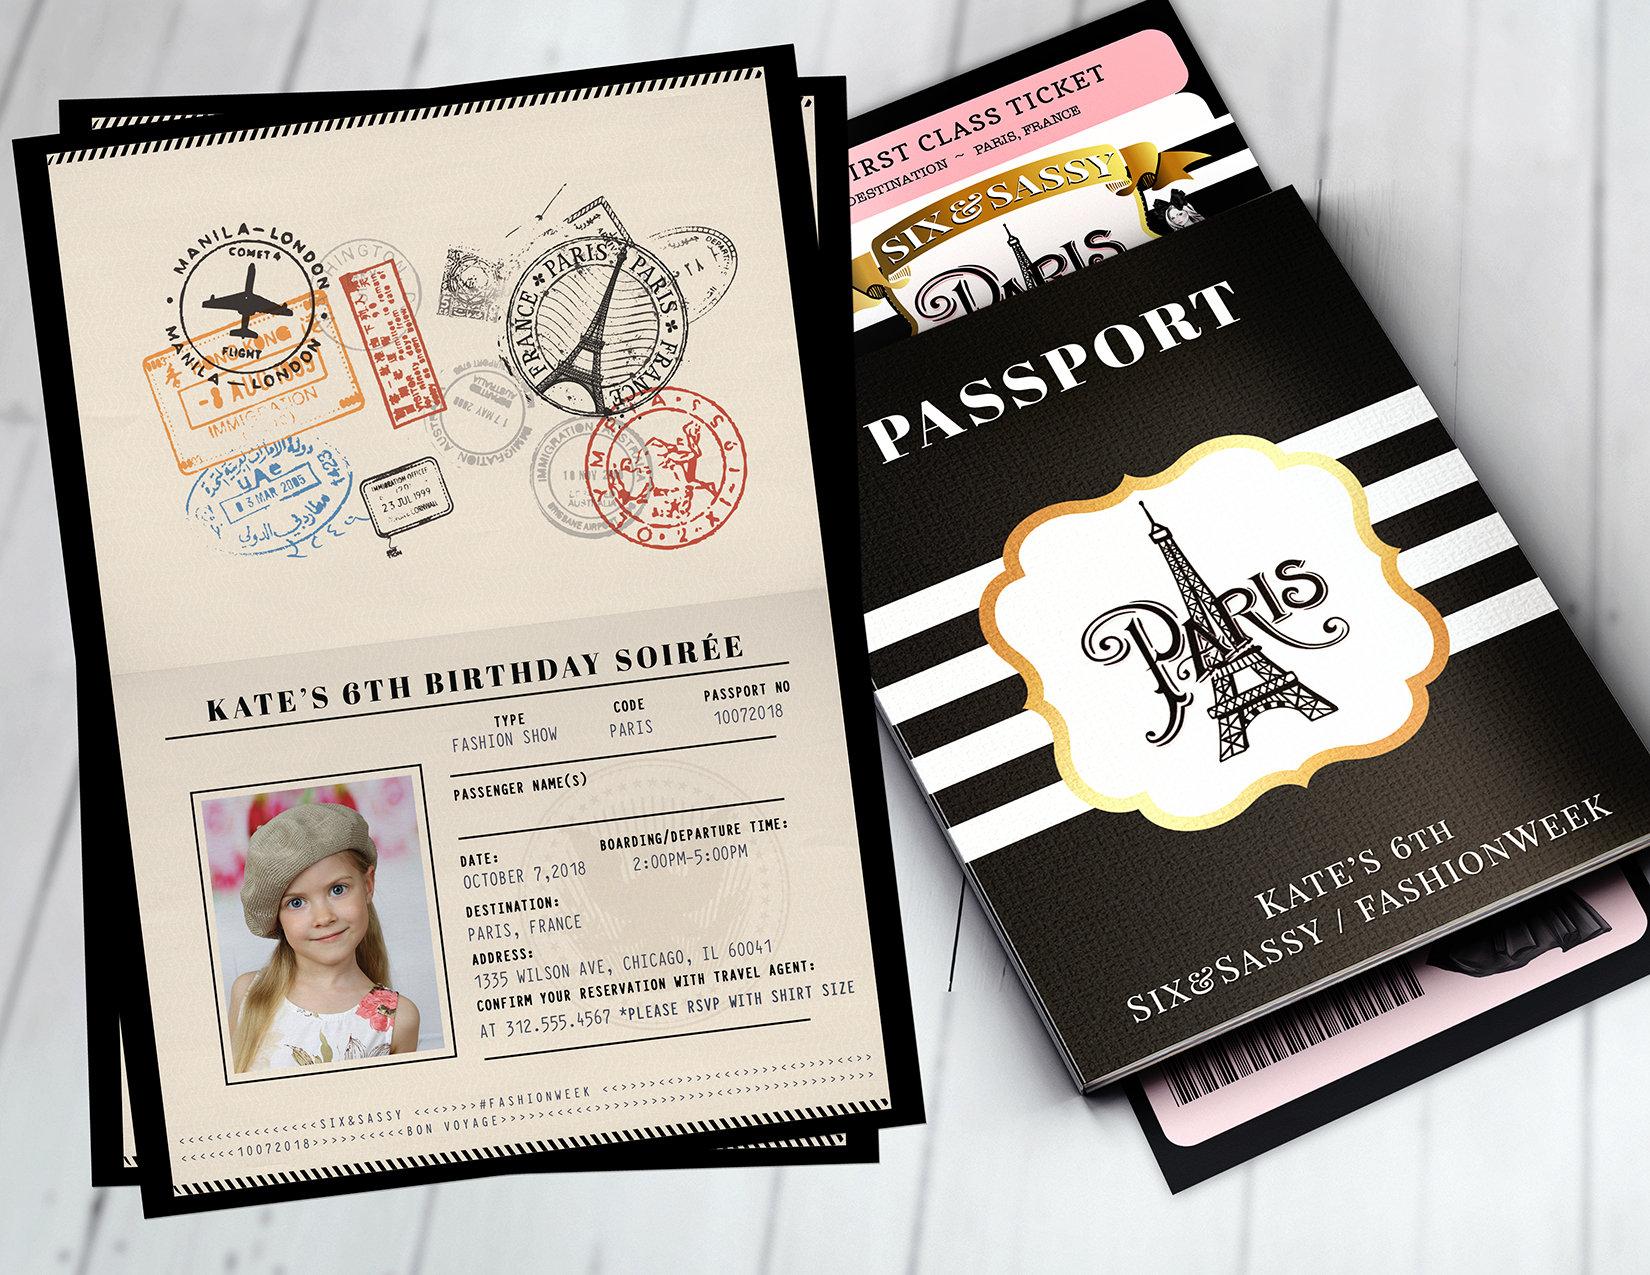 passport and ticket sweet 16 quinceanera invitation girl birthday